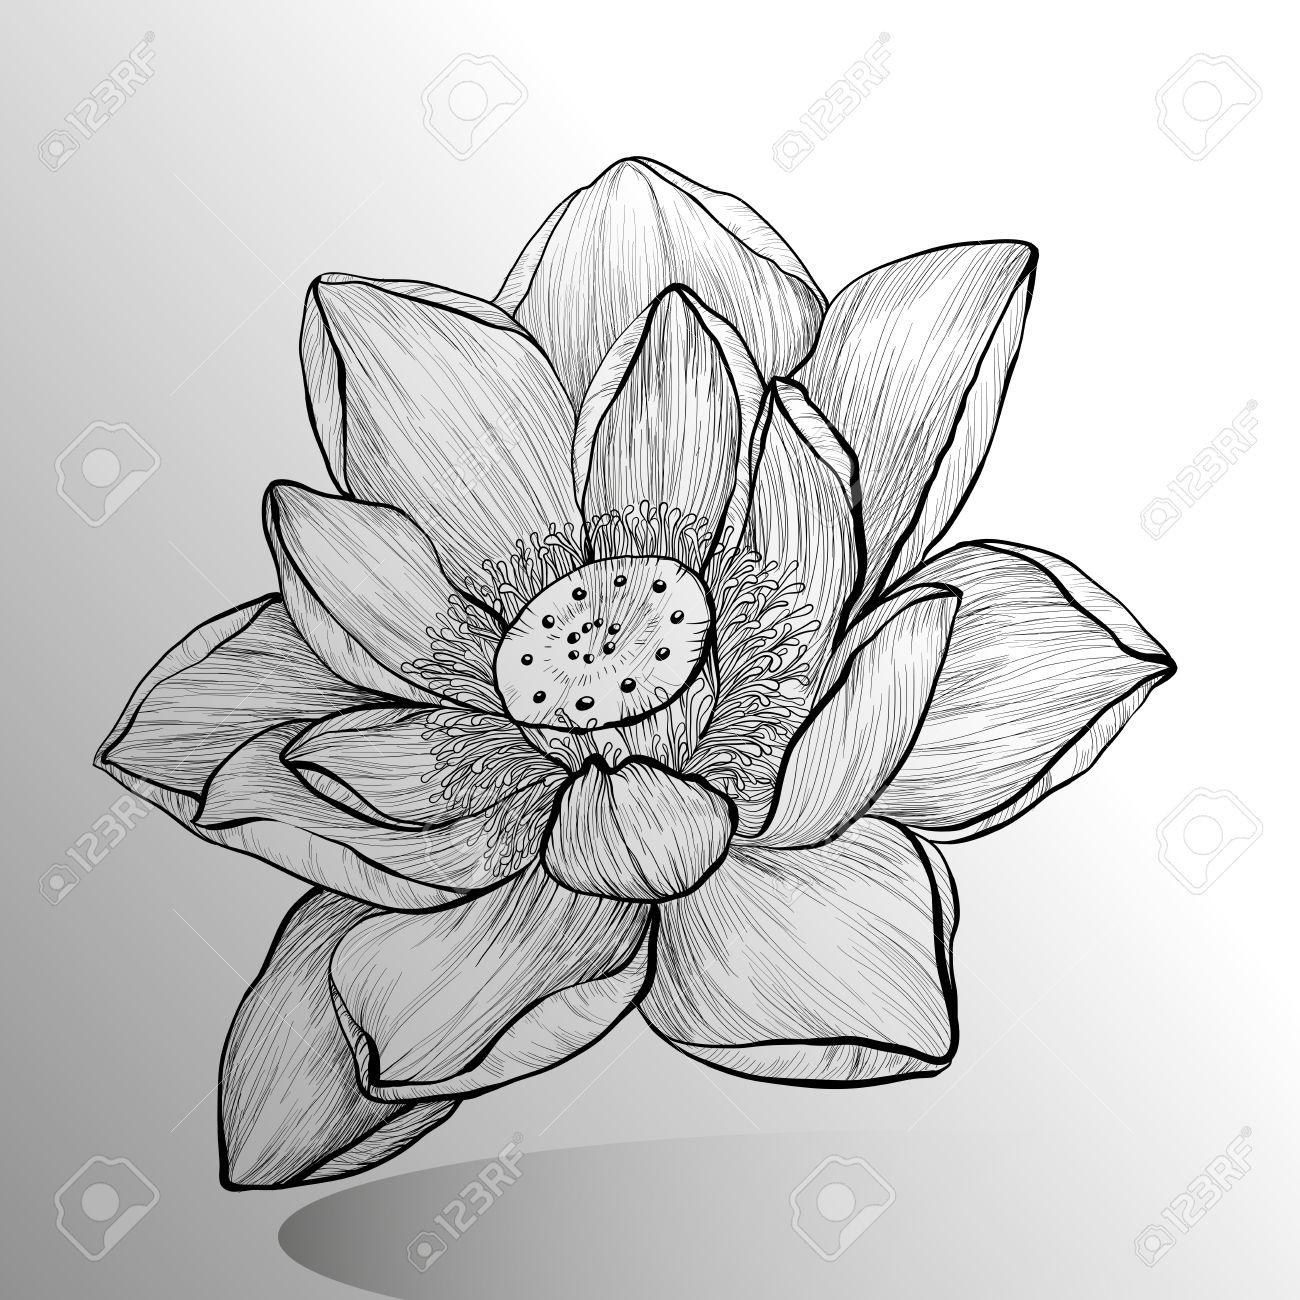 Hand drawn lotus flower sketch royalty free cliparts vectors and hand drawn lotus flower sketch stock vector 44639298 izmirmasajfo